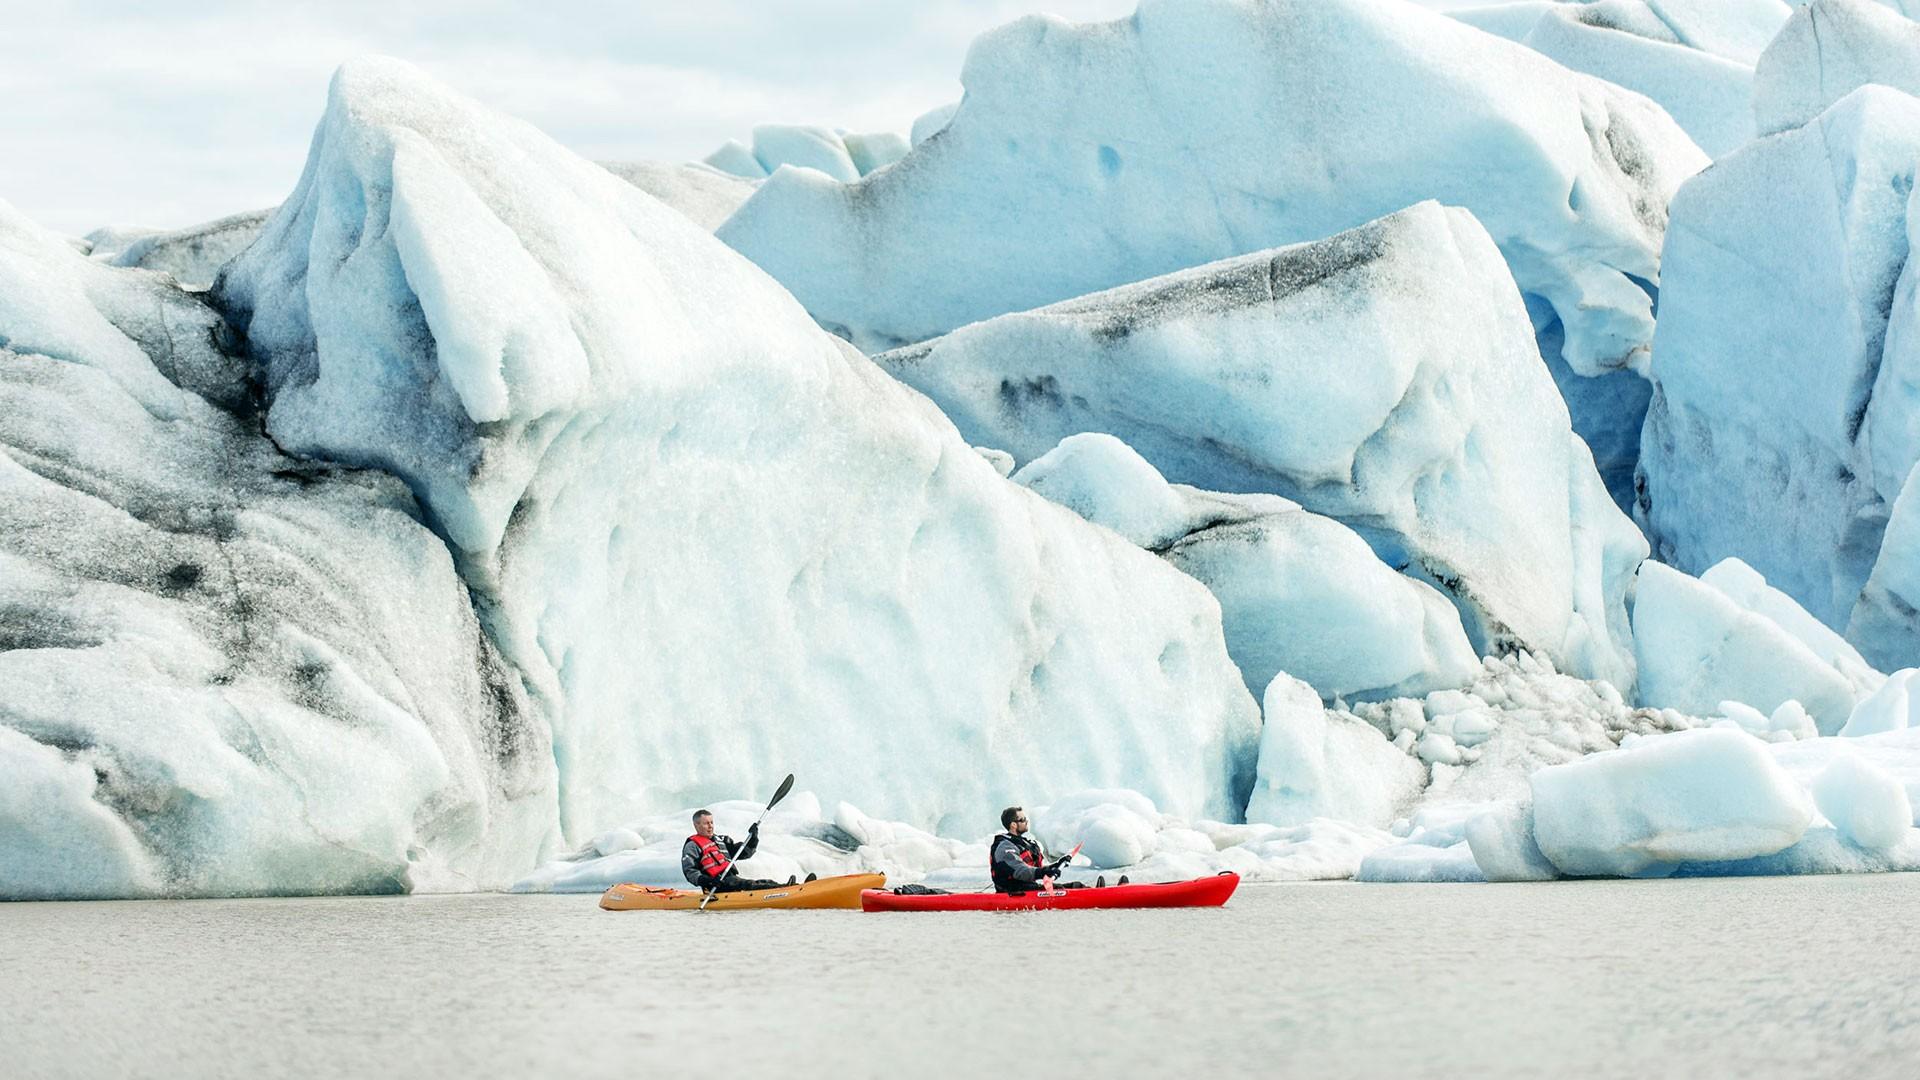 Glacier Lagoon Kayaking in Iceland, kayaking between icebergs